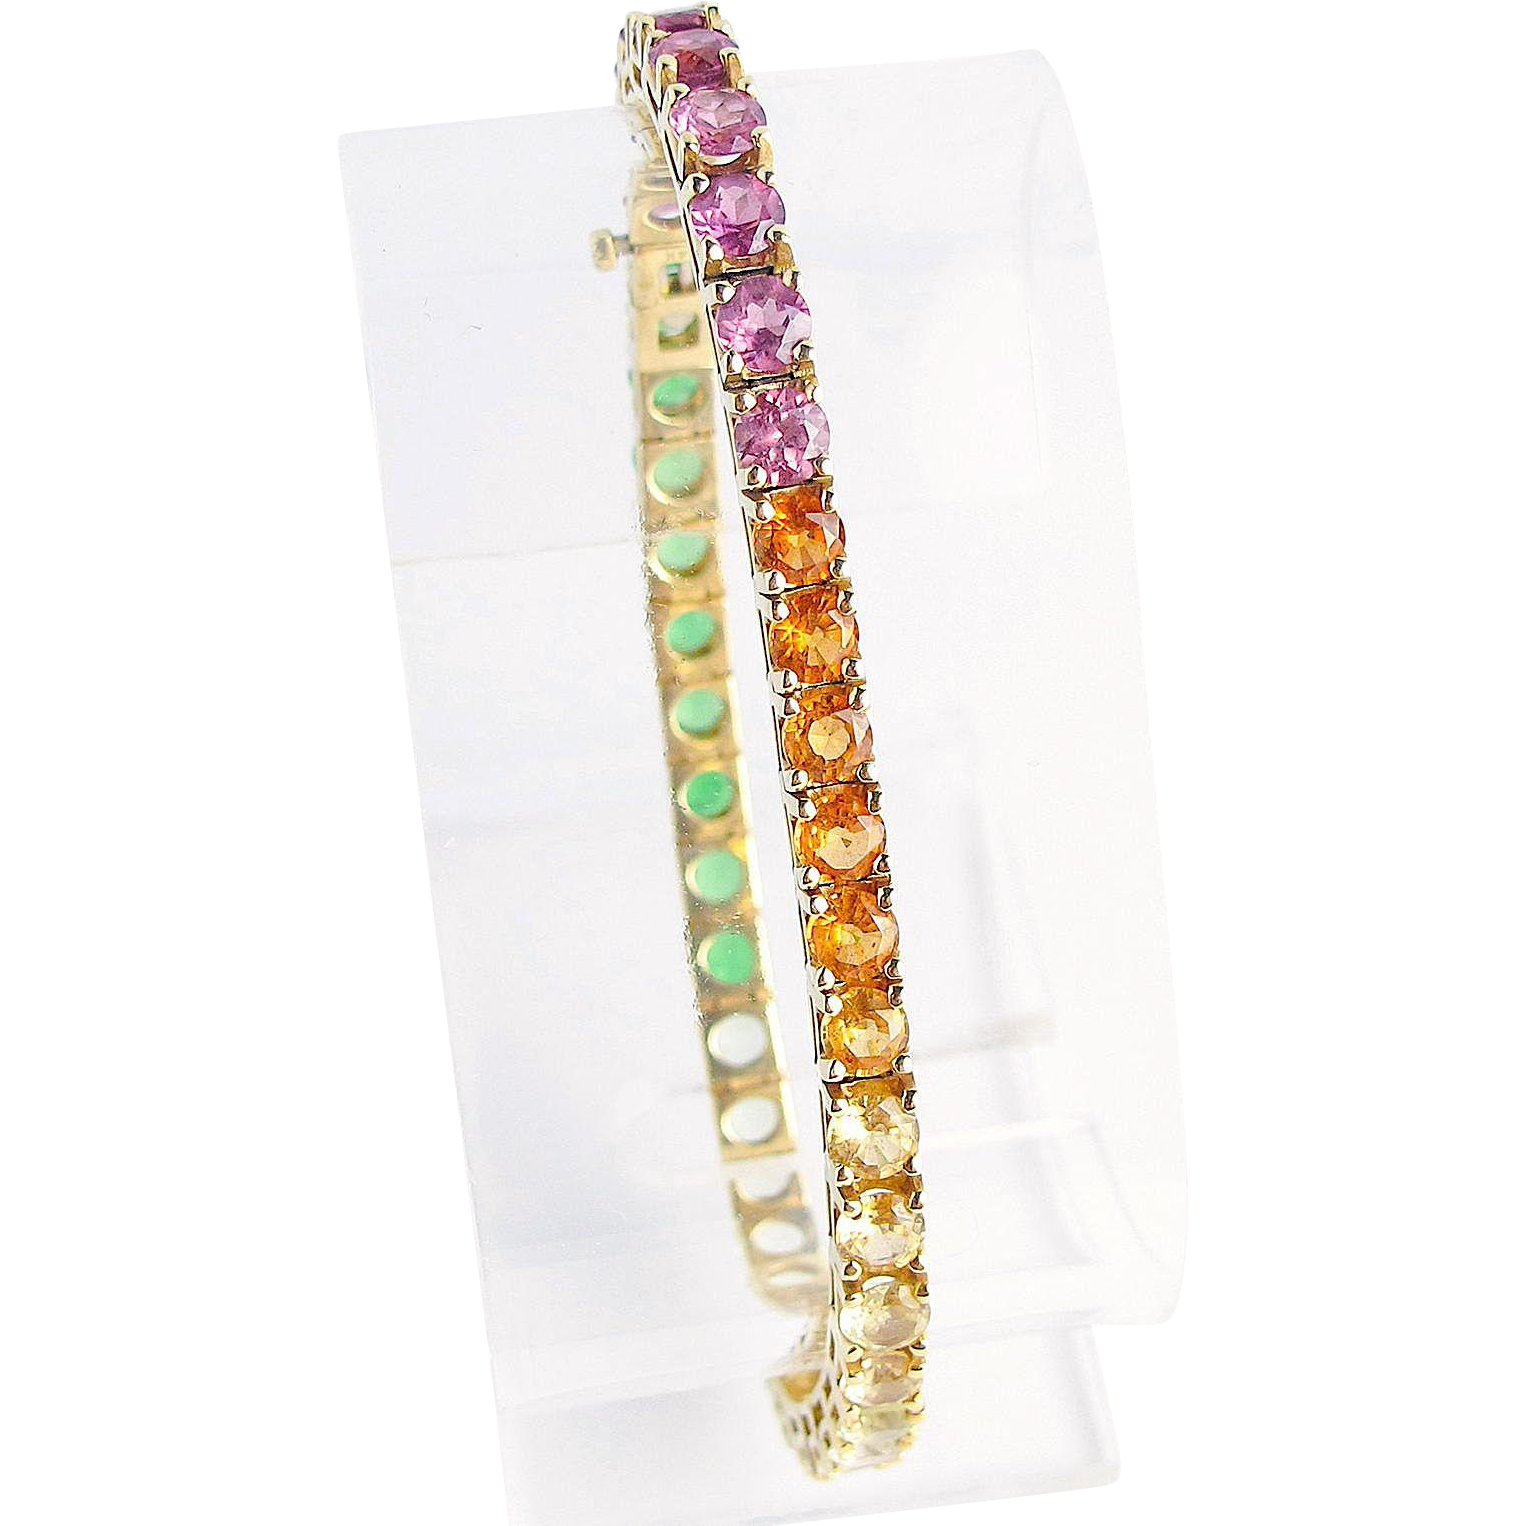 Sapphire, Tourmaline and Citrine, Rainbow Bracelet, 14K